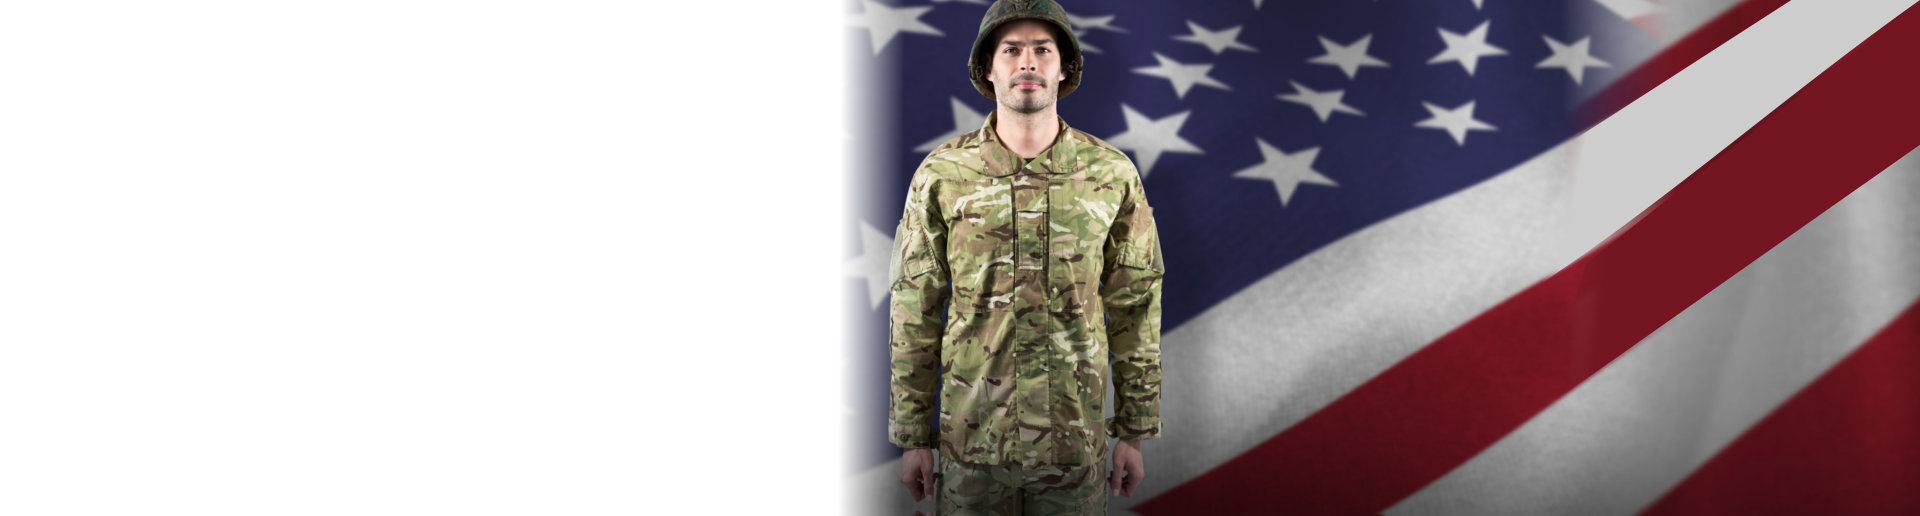 Portrait of confident soldier standing